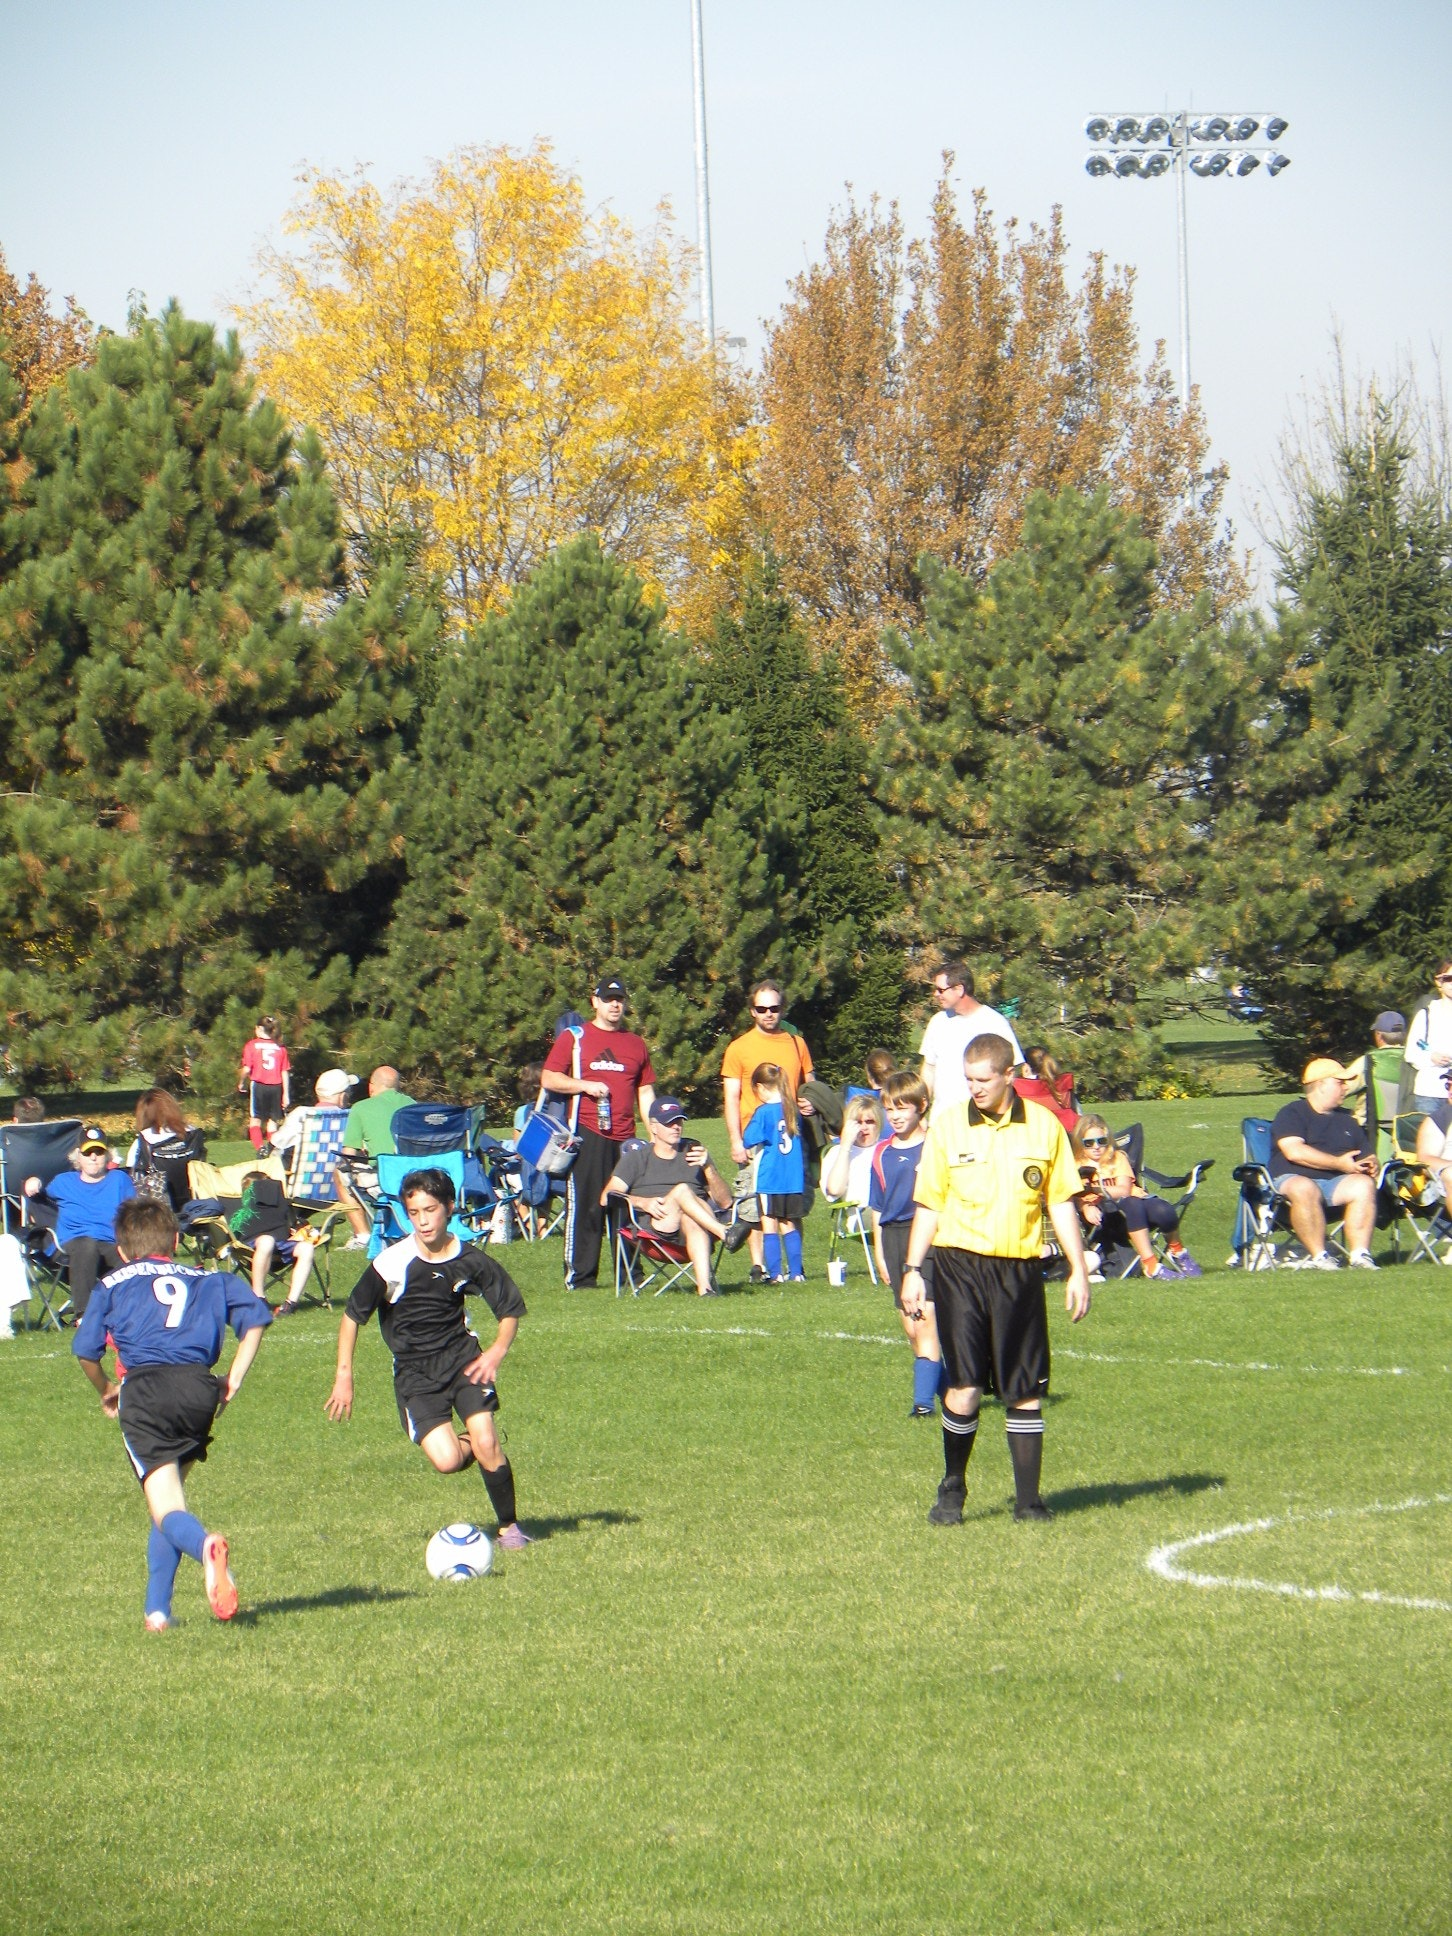 Crystal Lake Soccer Federation